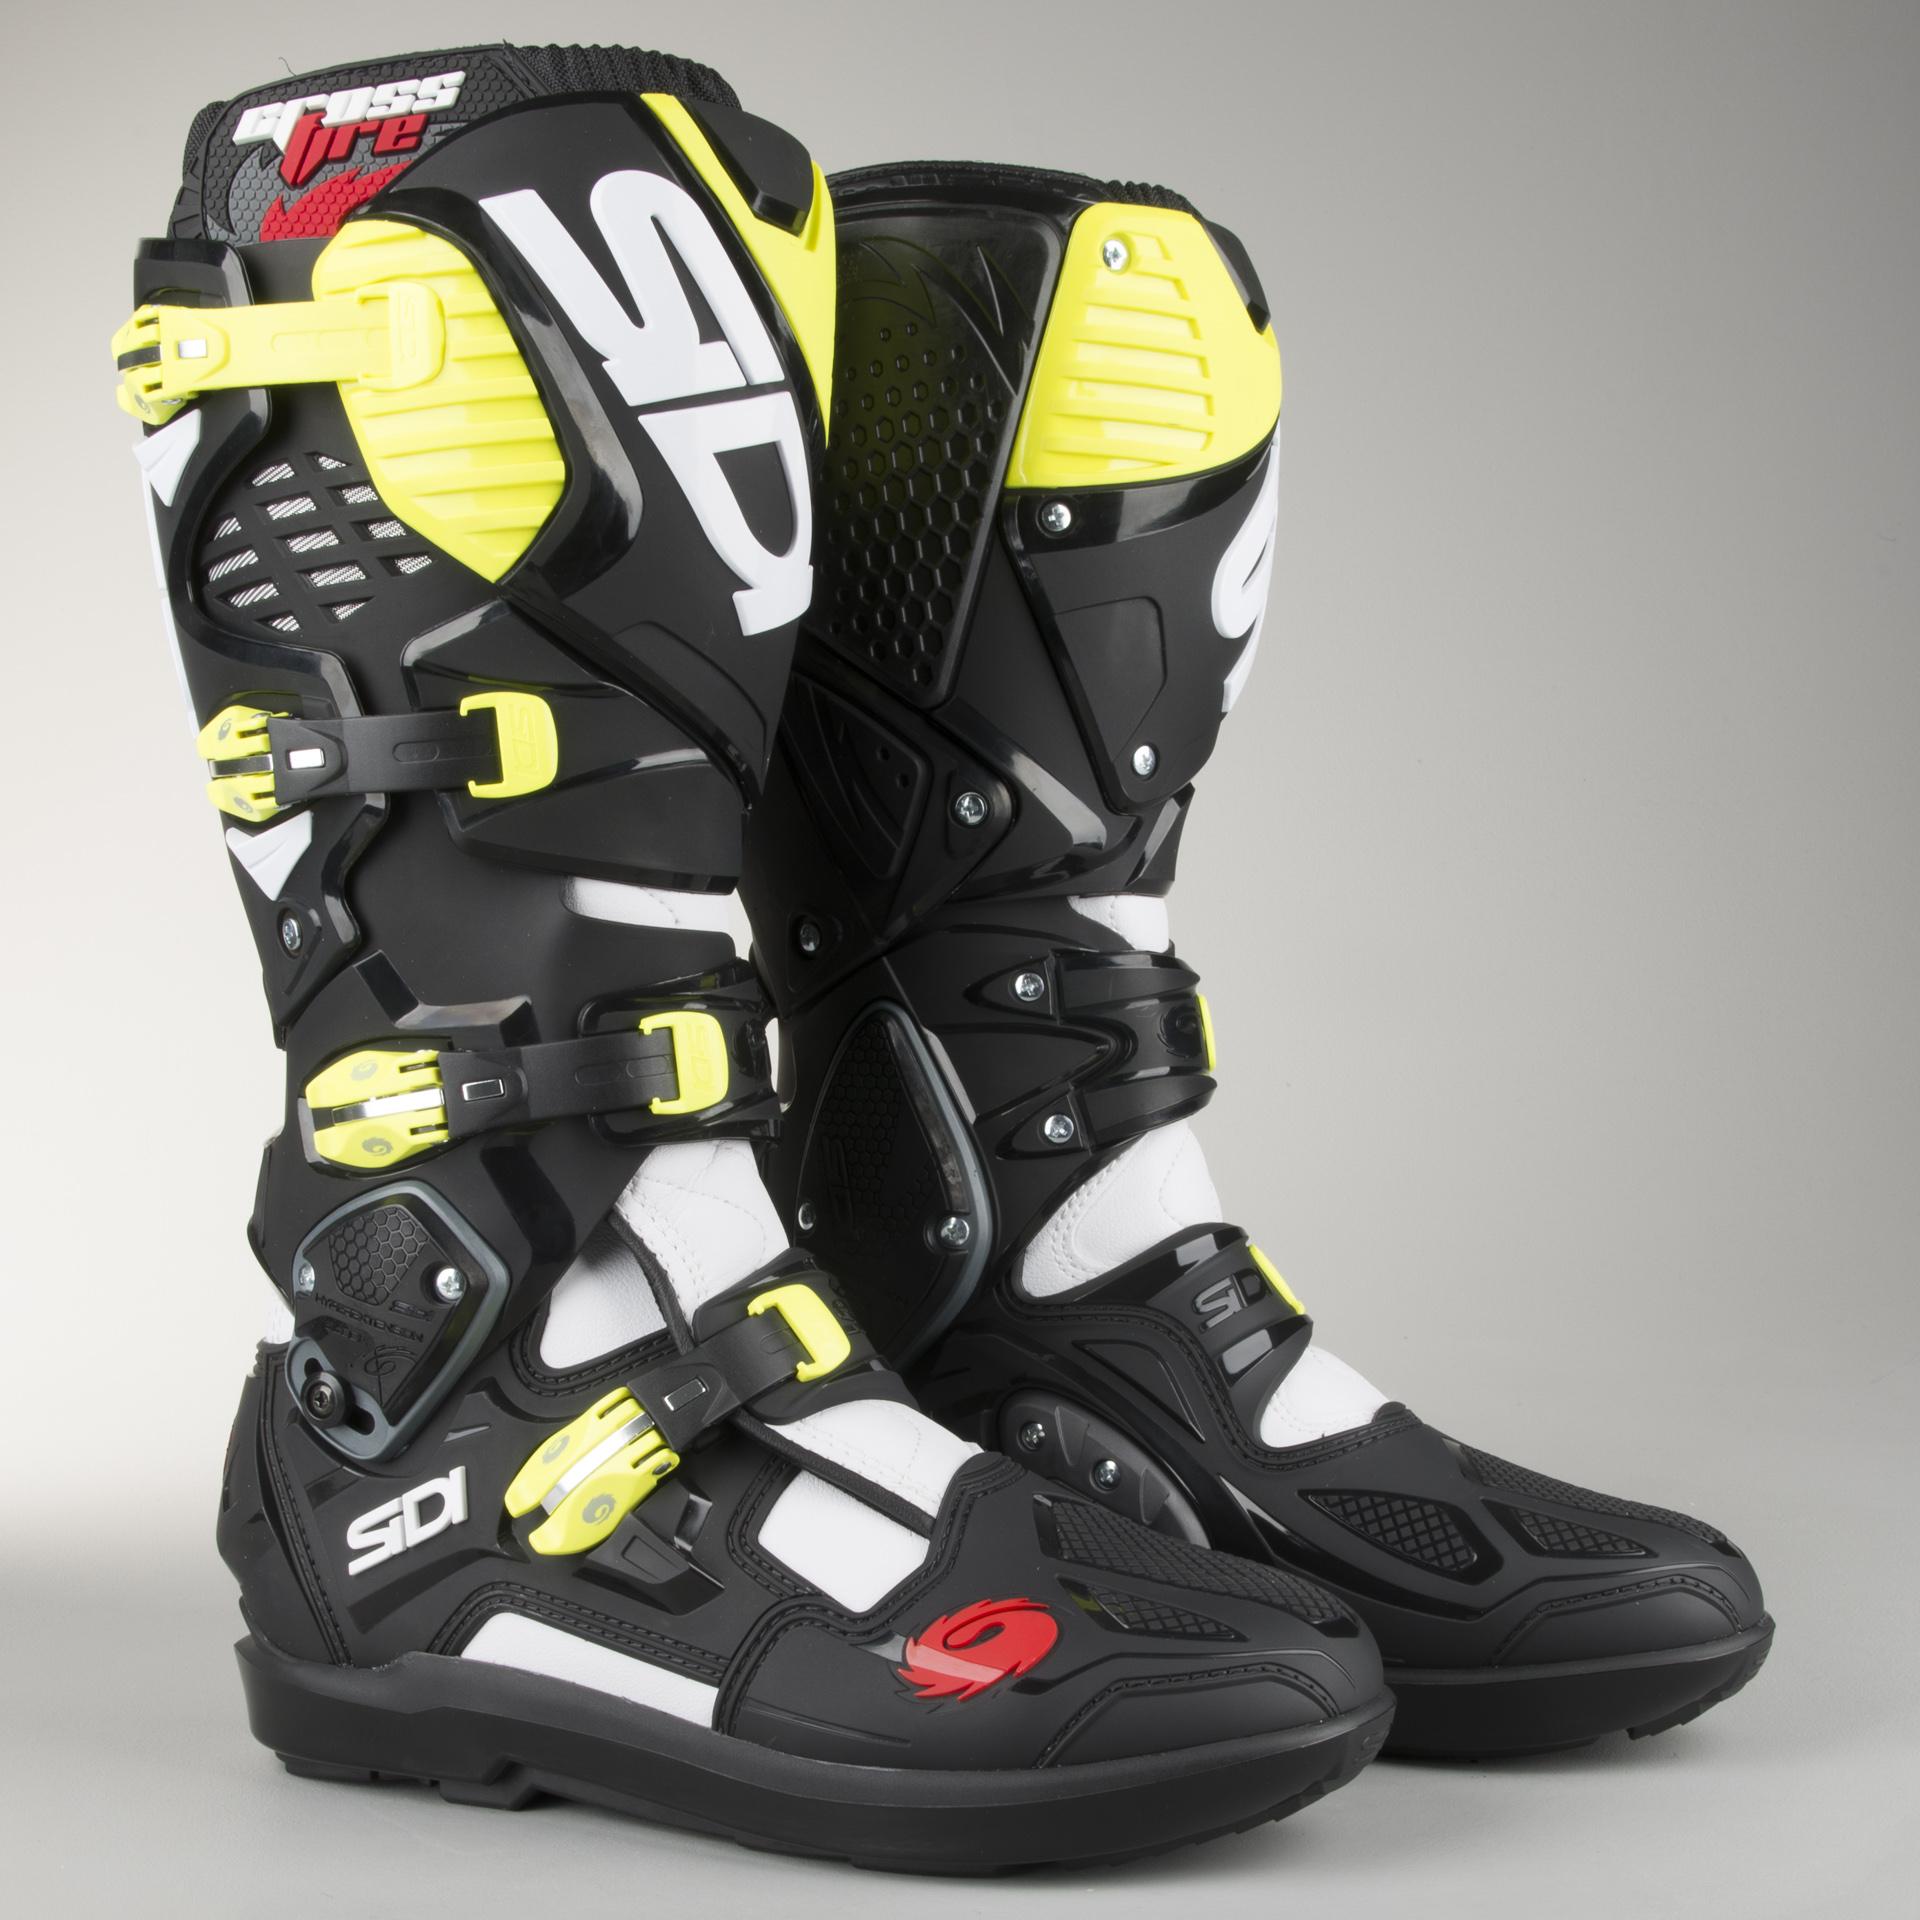 Size 46 Black//Ash//Yellow Fluo Sidi Sidi Crossfire 3 SRS Motorcycle Boot